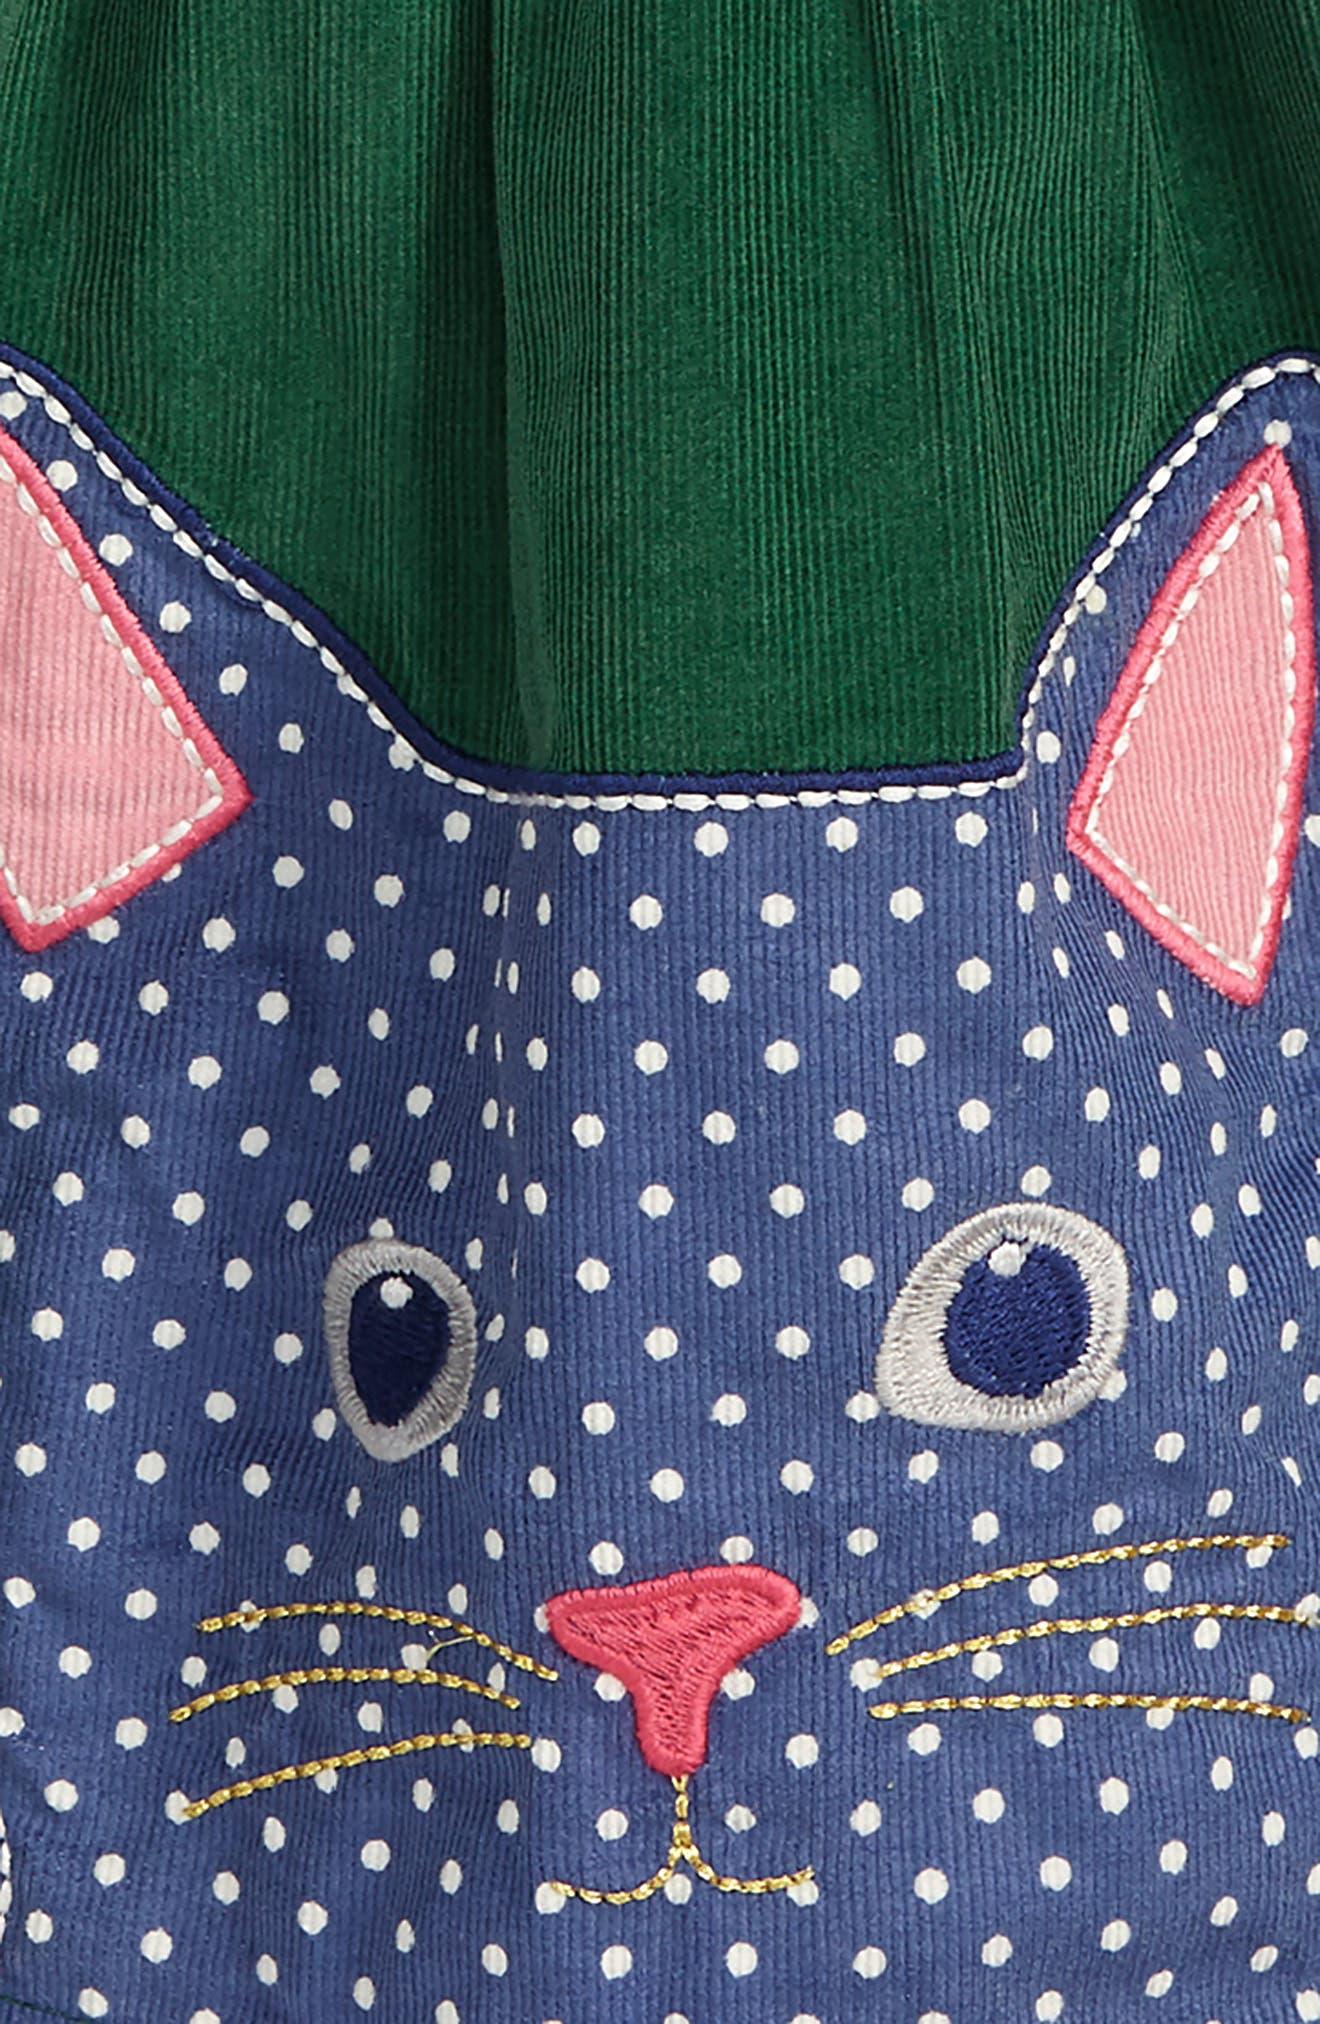 Animal Appliqué Skirt,                             Alternate thumbnail 2, color,                             WILLOW GREEN CAT